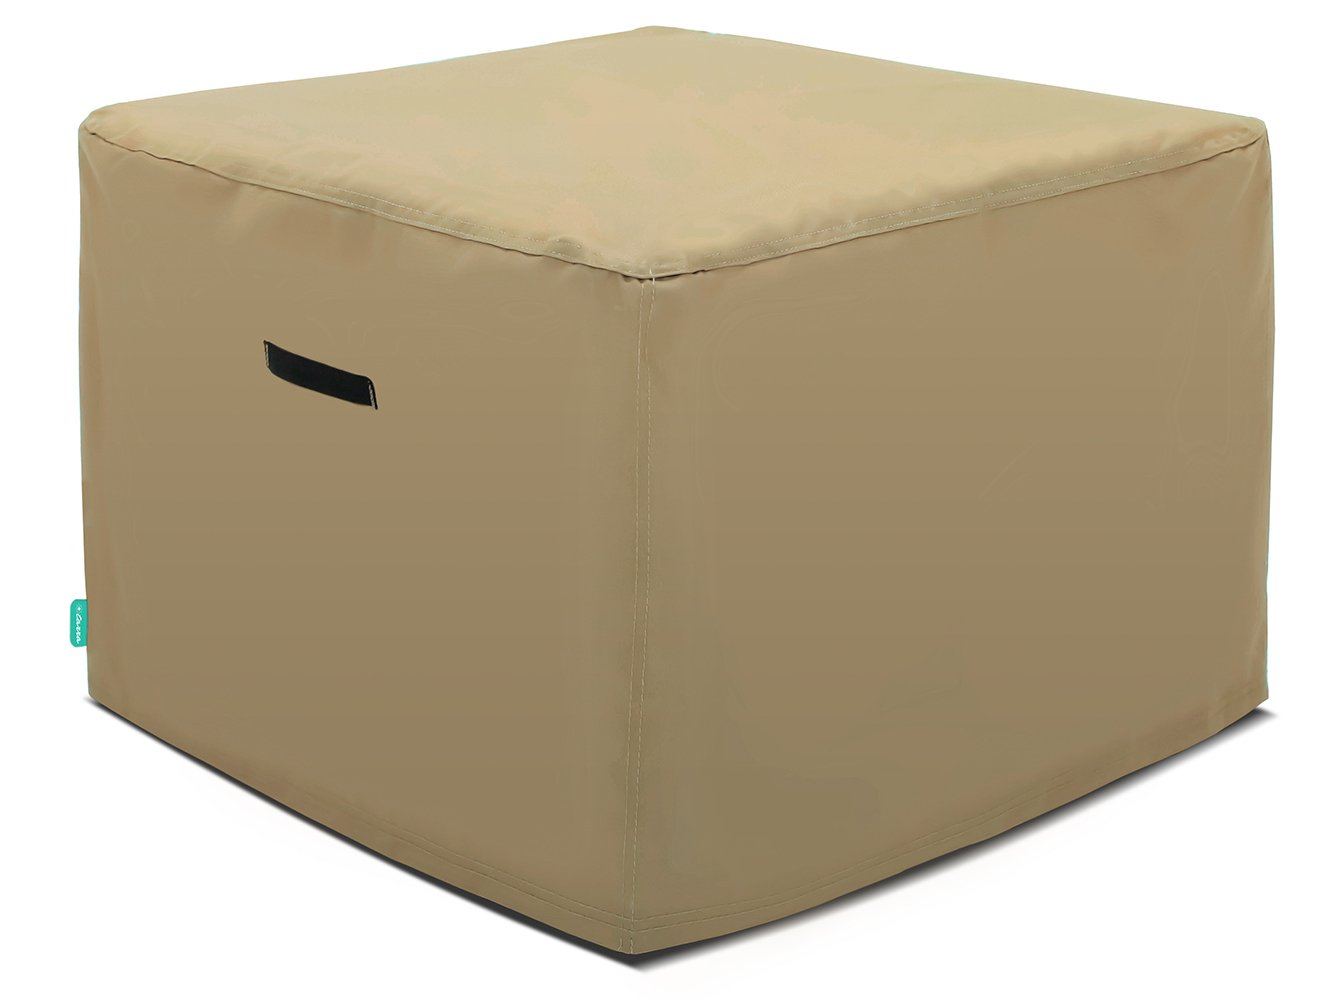 Tarra Home UFCOZ262221PT5 Universal Waterproof Furniture Cover, 26'' x 22'' x 21'' Tan